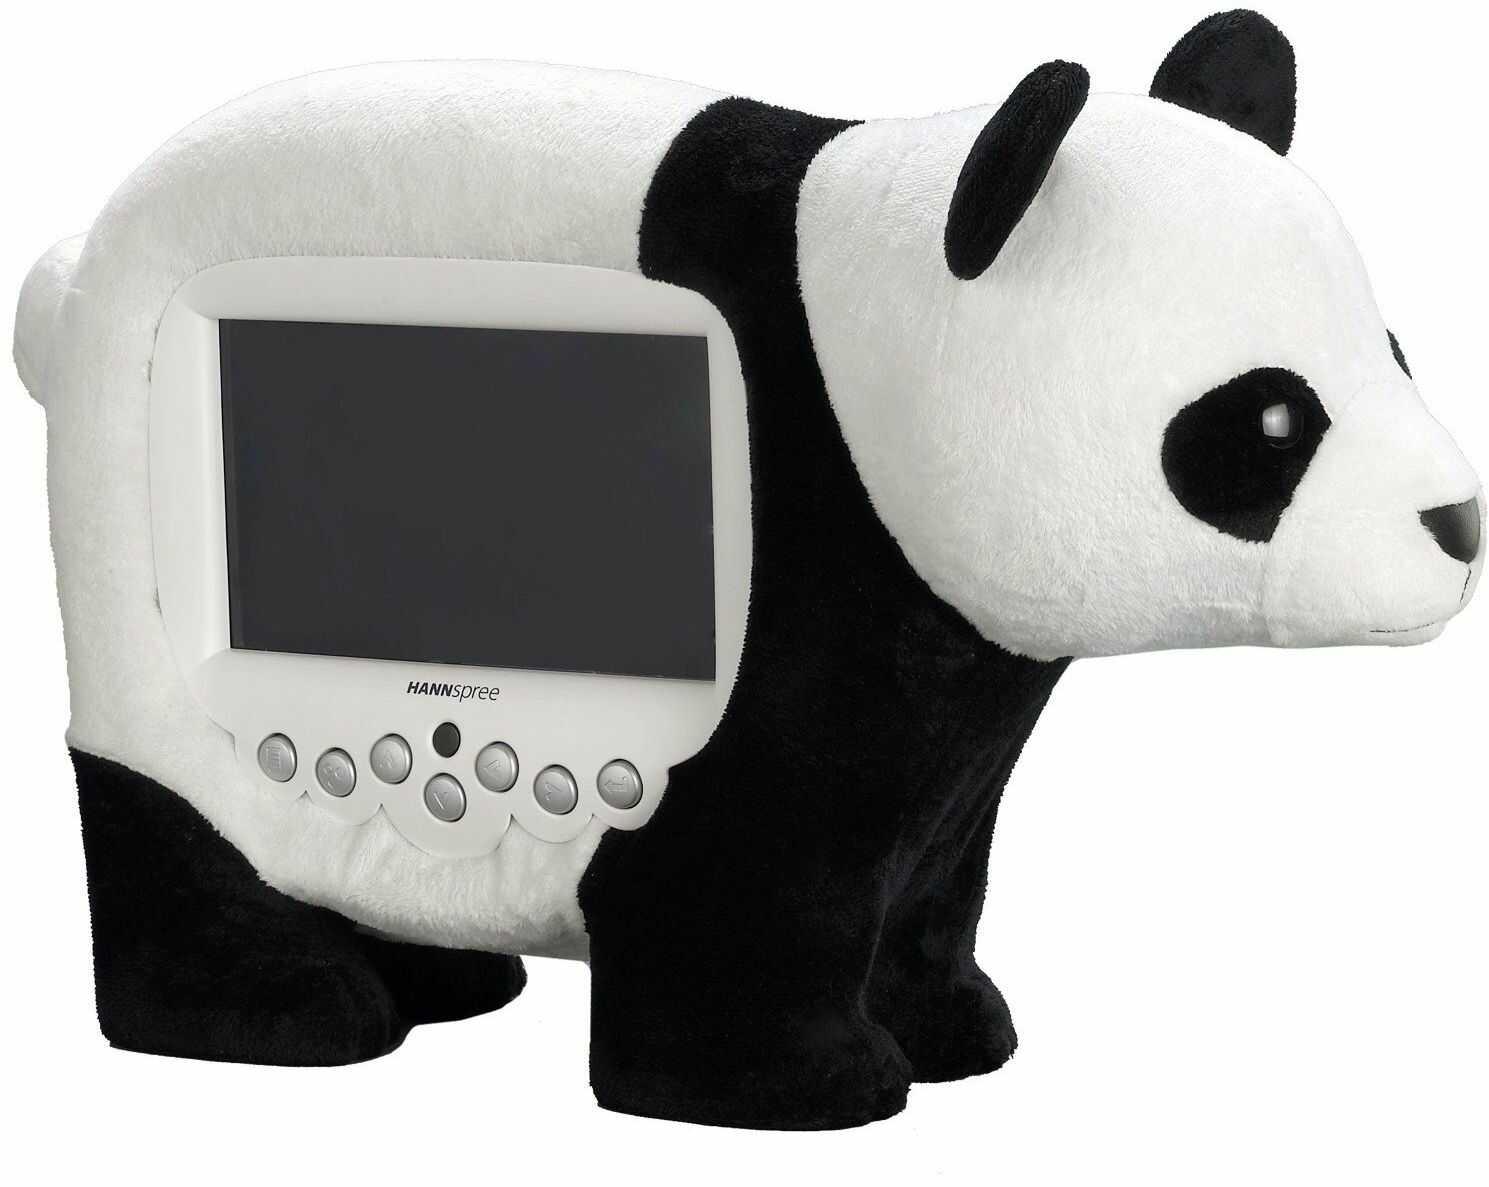 "Hannspree cyfrowa ramka na zdjęcia Panda / 20,32 cm (8"") (LED, 800 x 480, JPEG, MP3)"